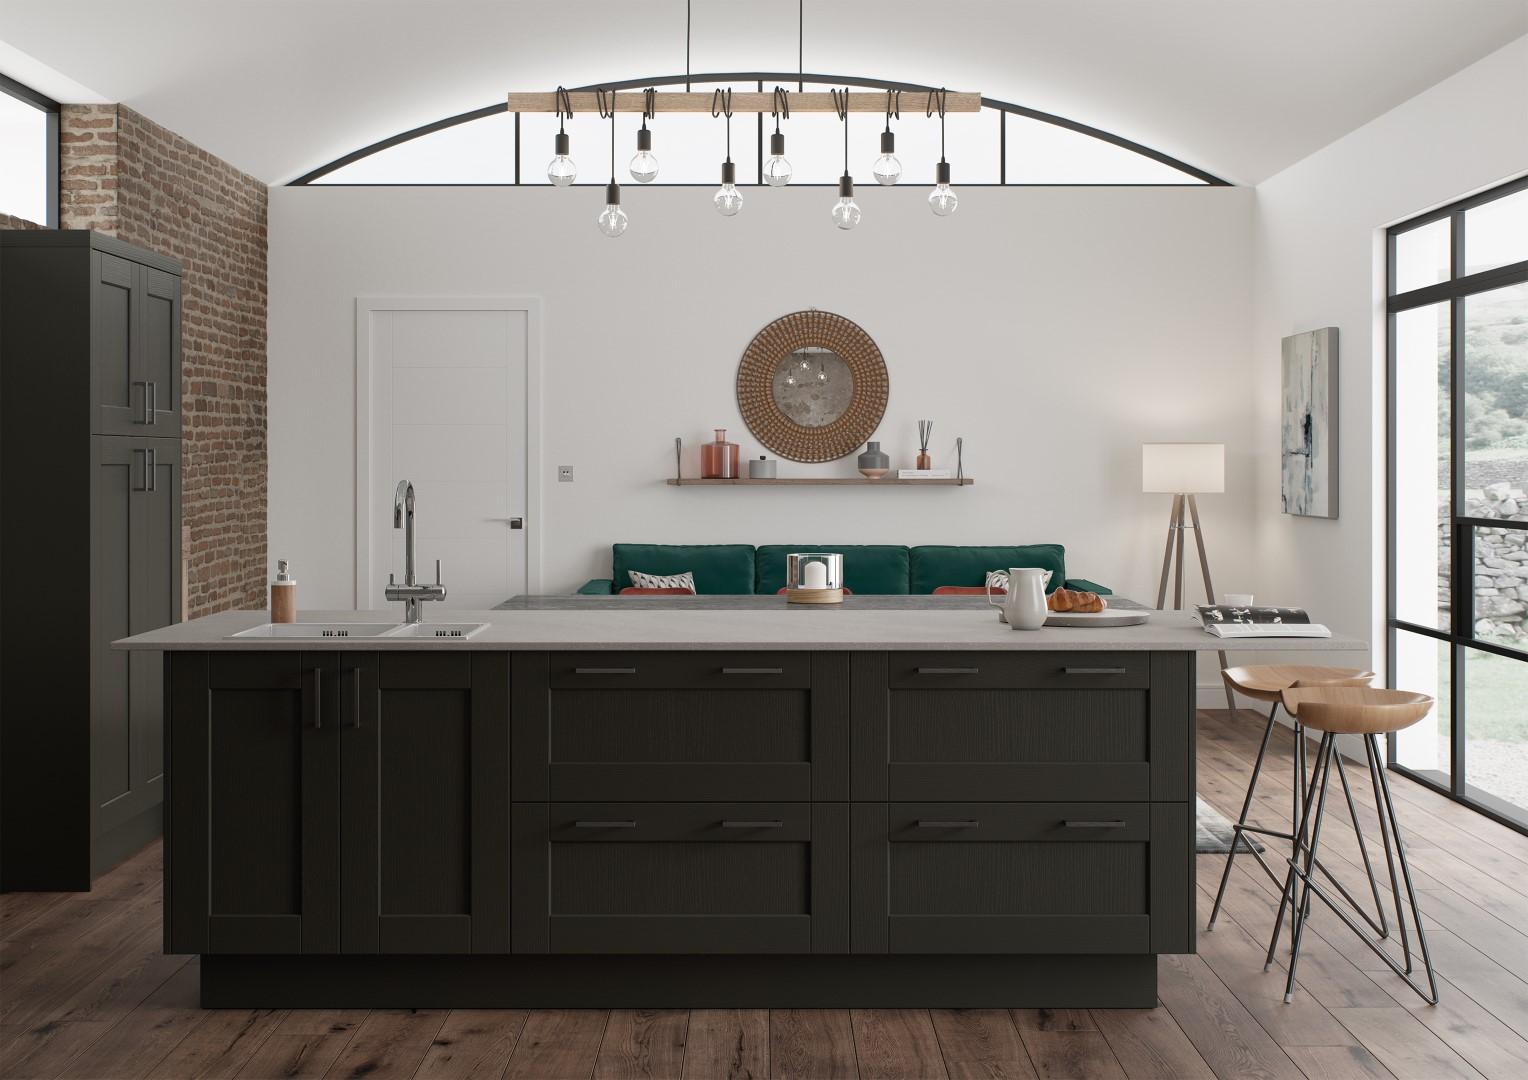 Kensington Graphite - Kitchen Design - Alan Kelly Kitchens Waterford - 4